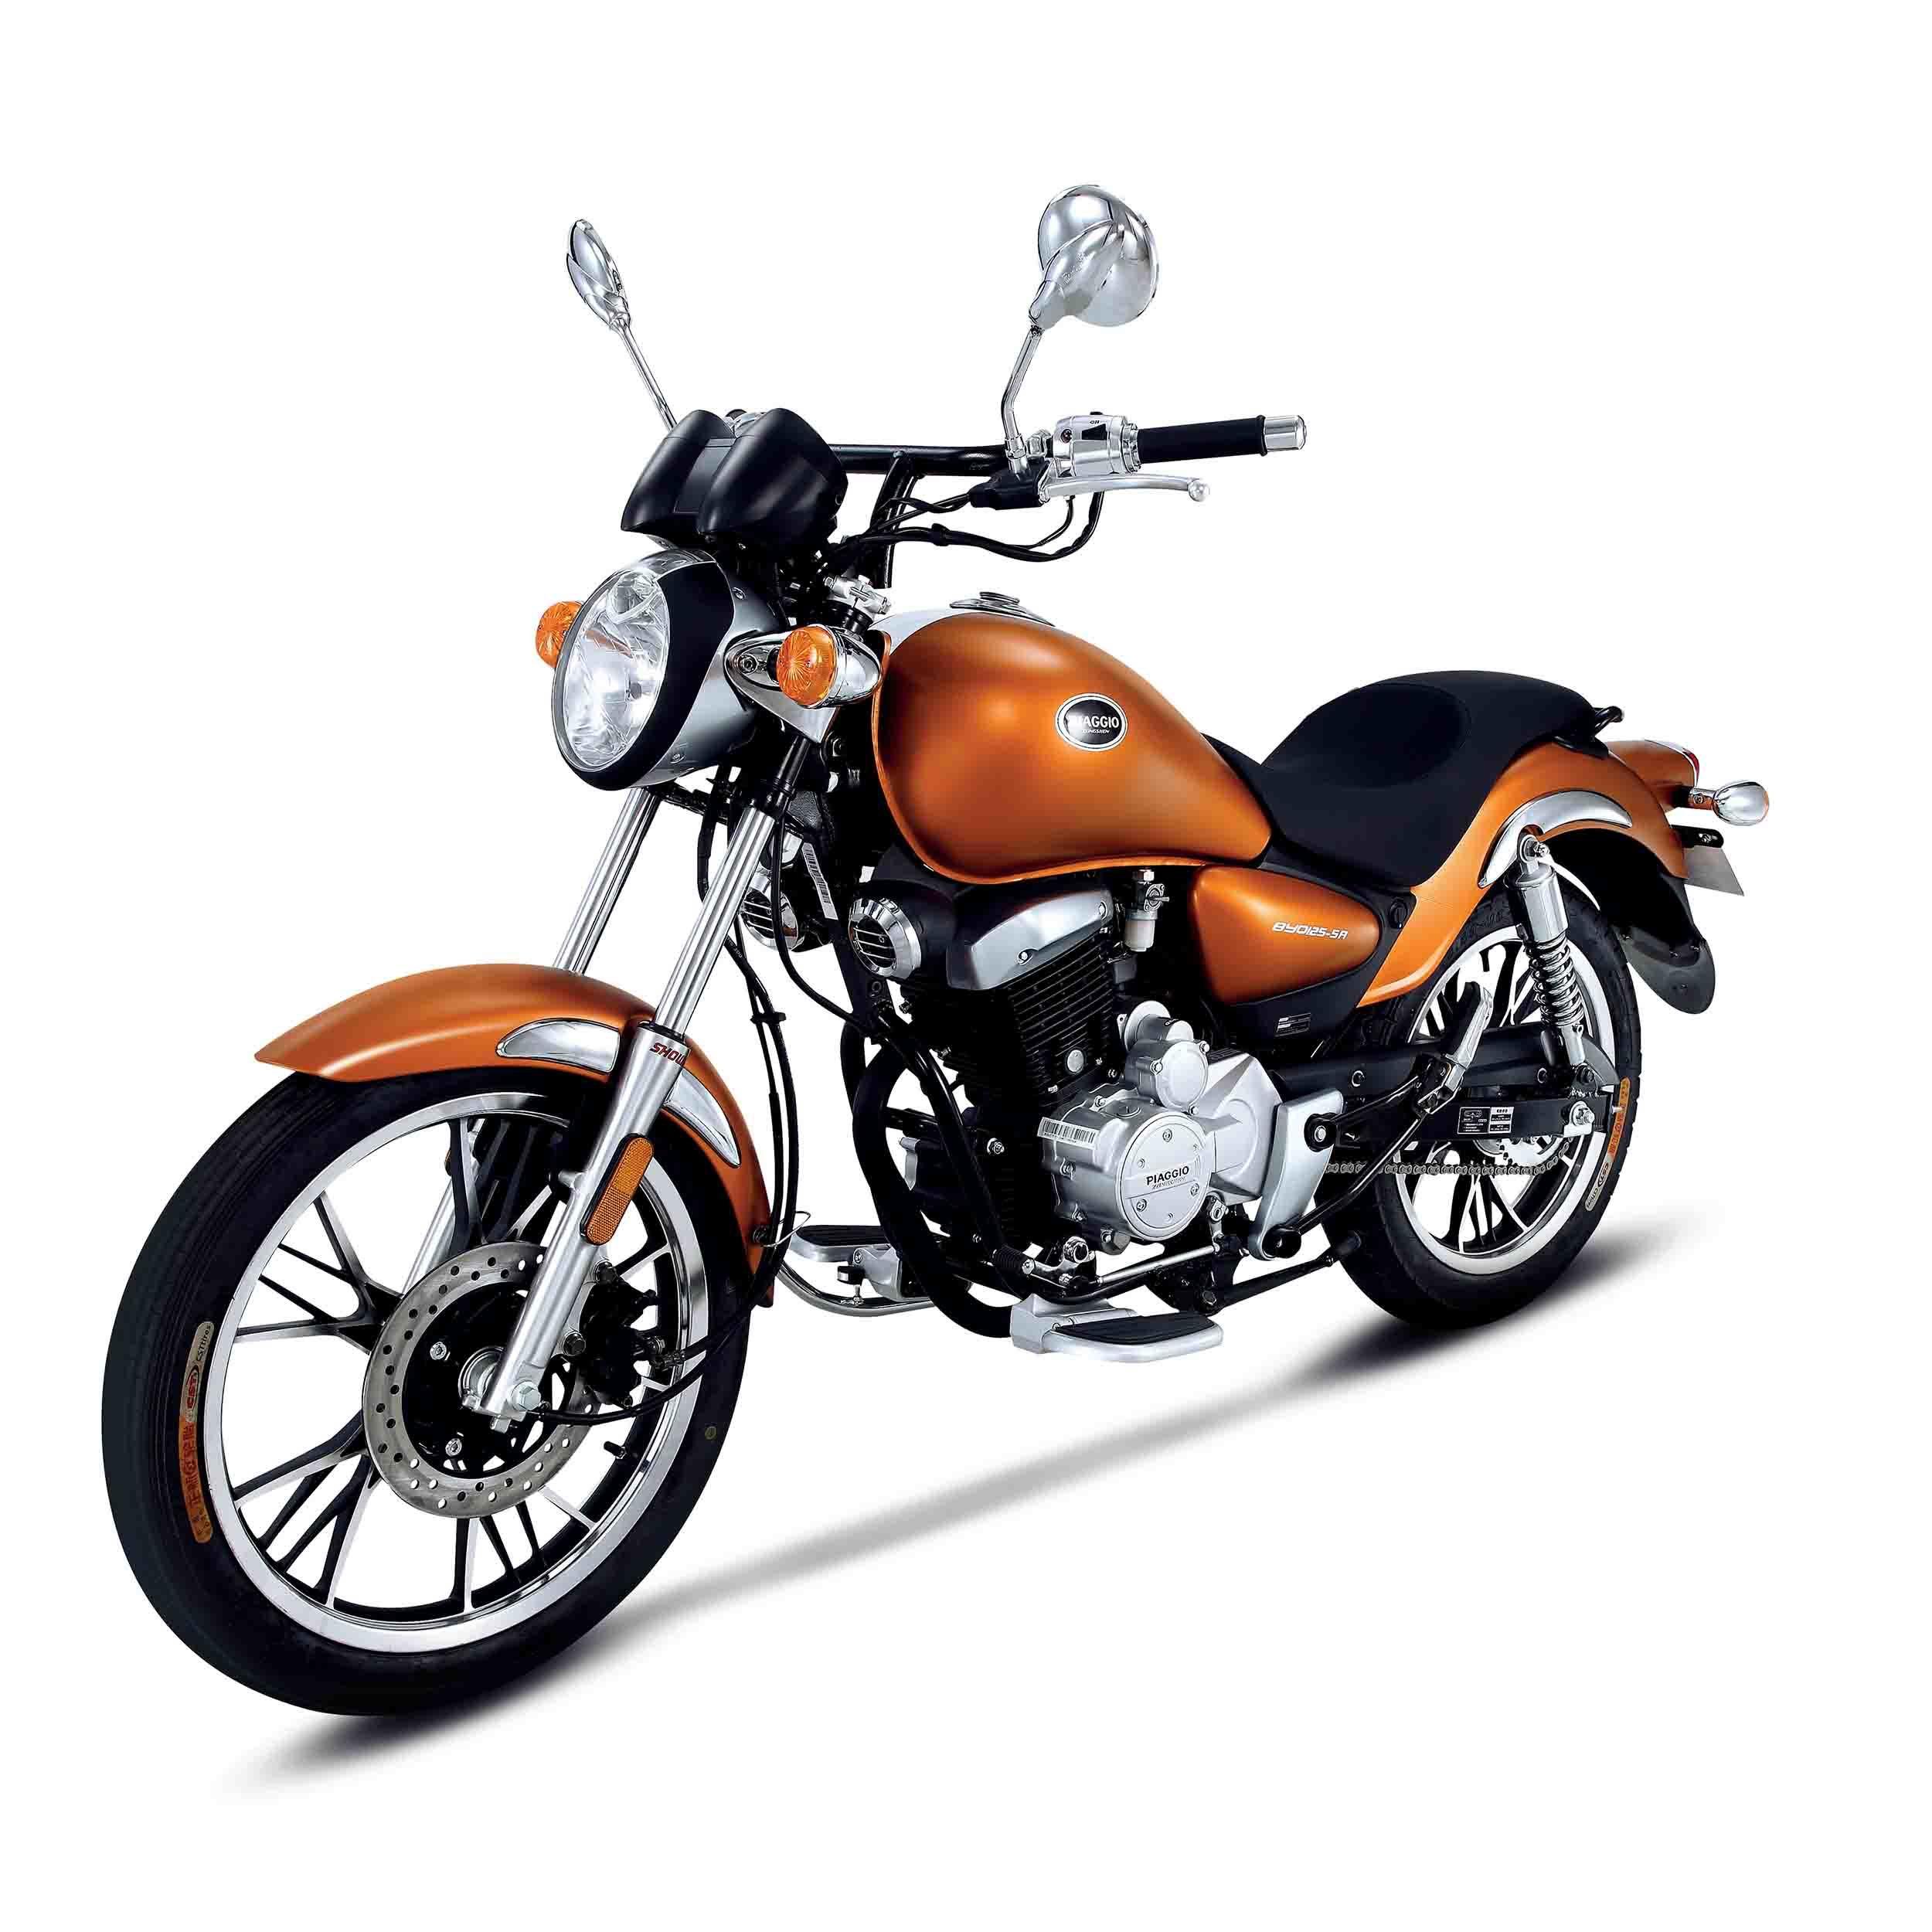 150cc yamaha motorcycle 150cc yamaha motorcycle products for Yamaha motorcycles made in china